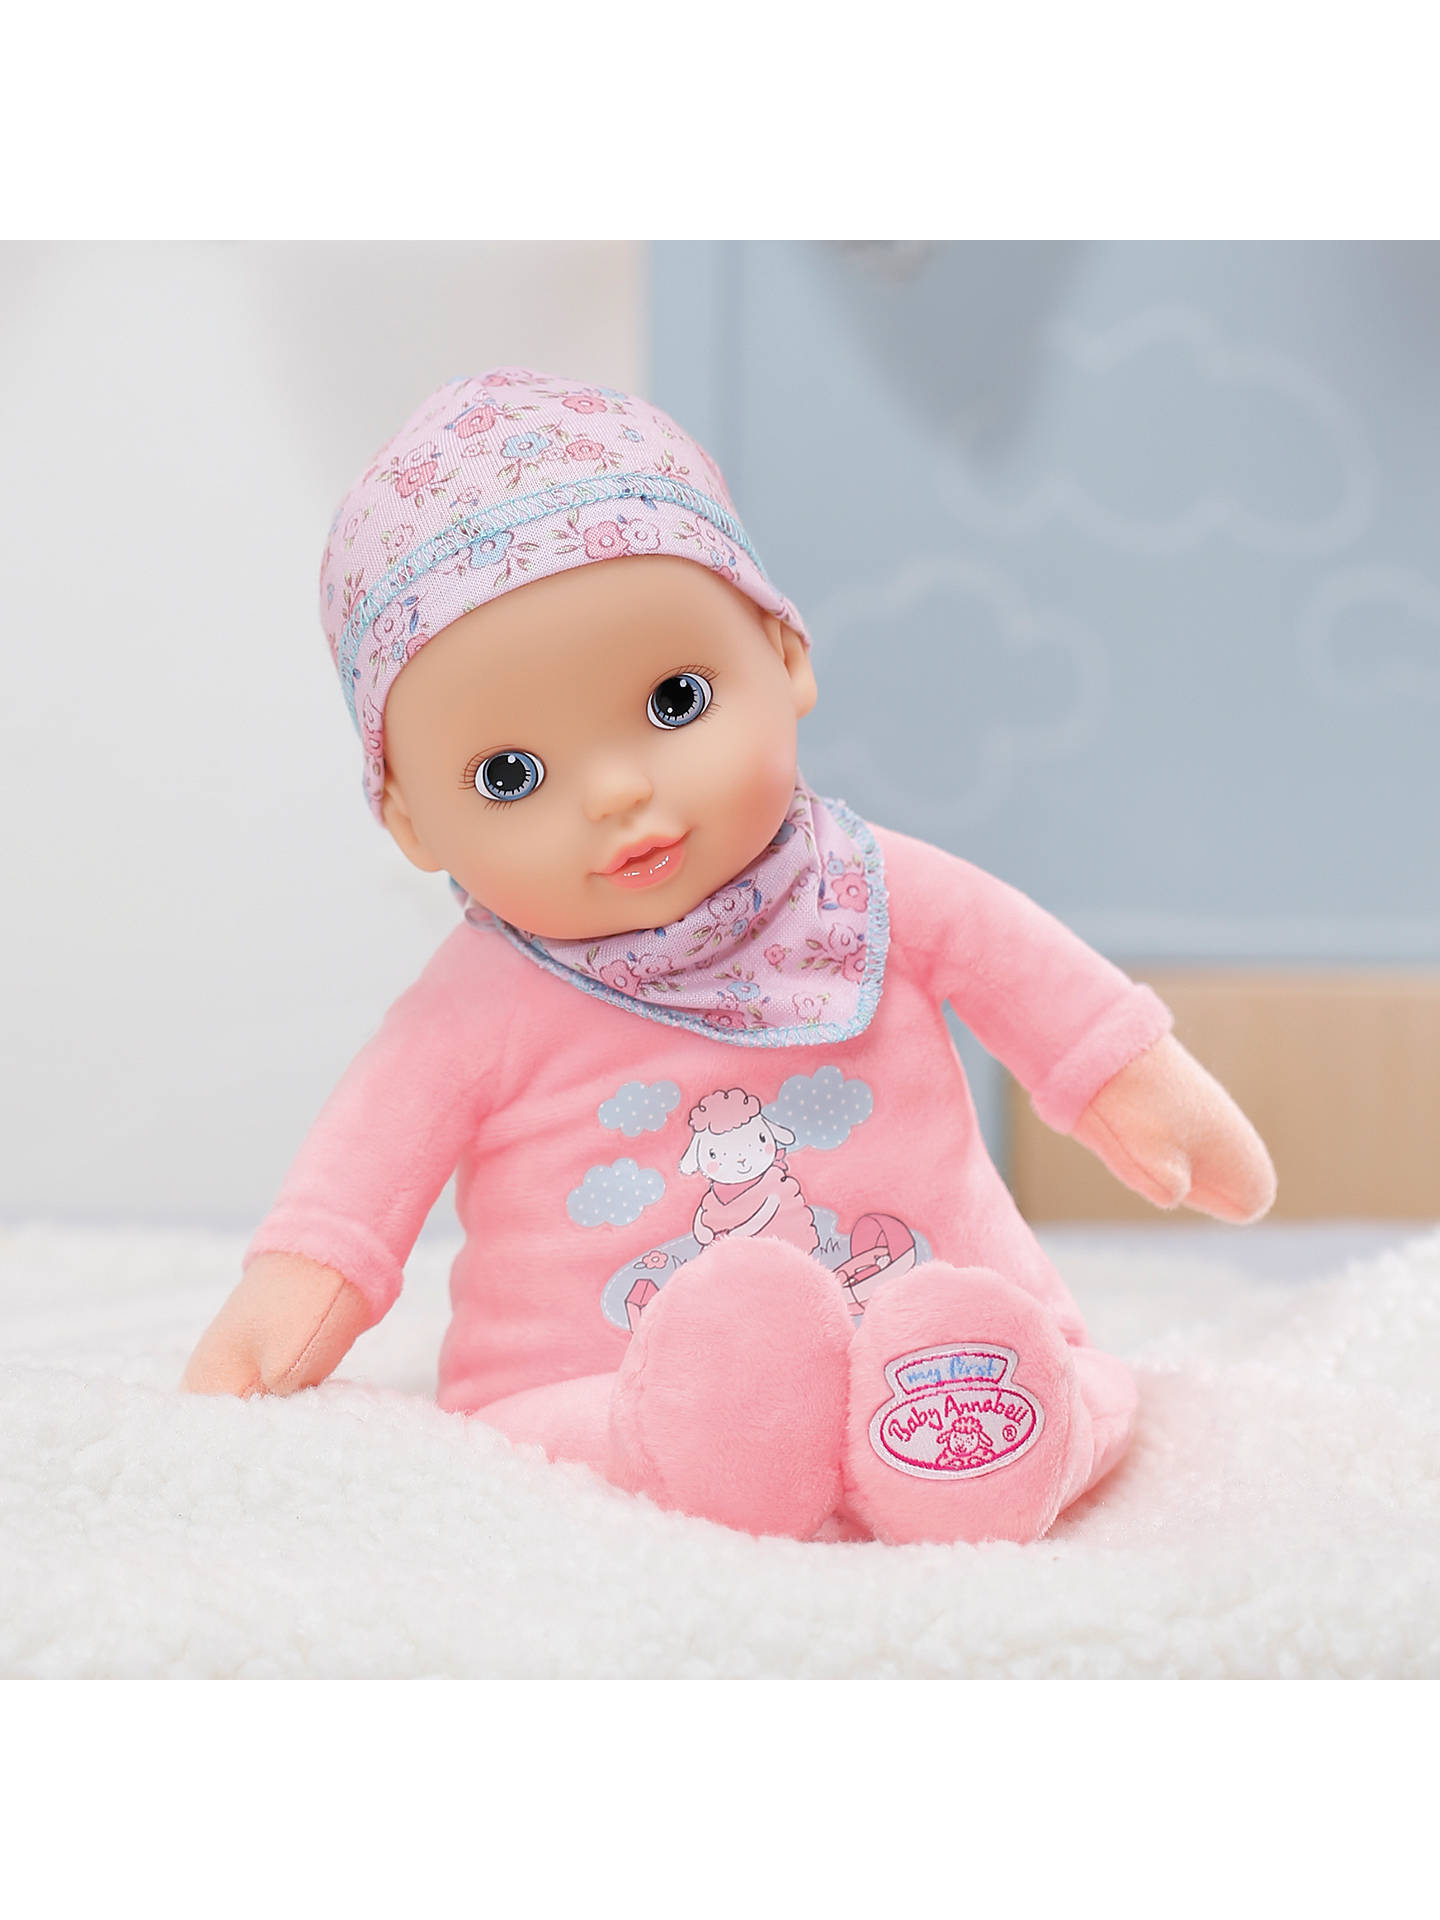 Zapf My First Baby Annabell Newborn Doll At John Lewis